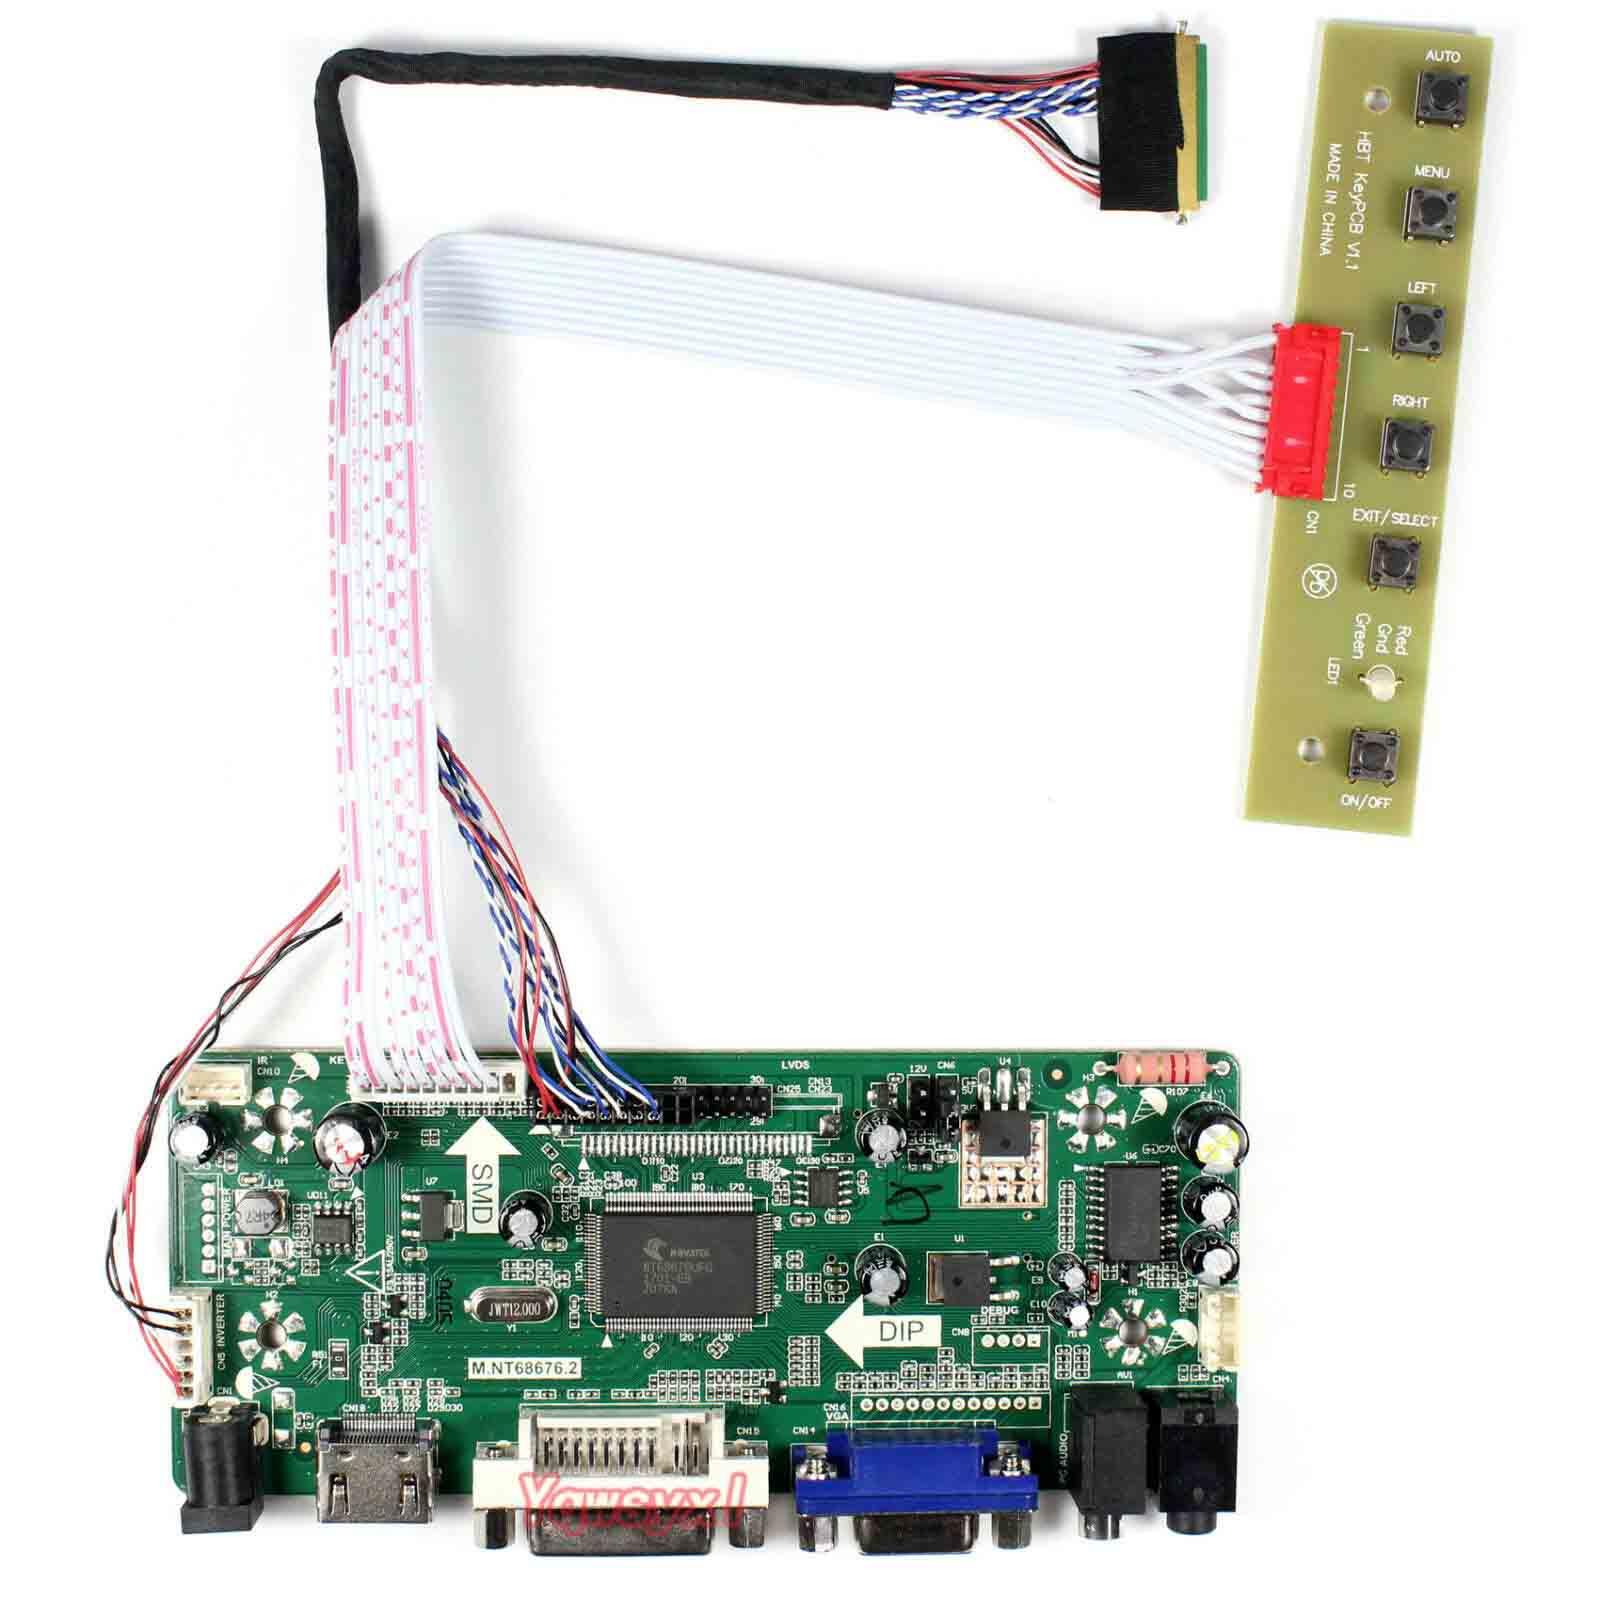 Yqwsyxl Control Board Monitor Kit For LP156WH3(TL)(S1)  LP156WH3-TLS1  HDMI+DVI+VGA LCD LED Screen Controller Board Driver